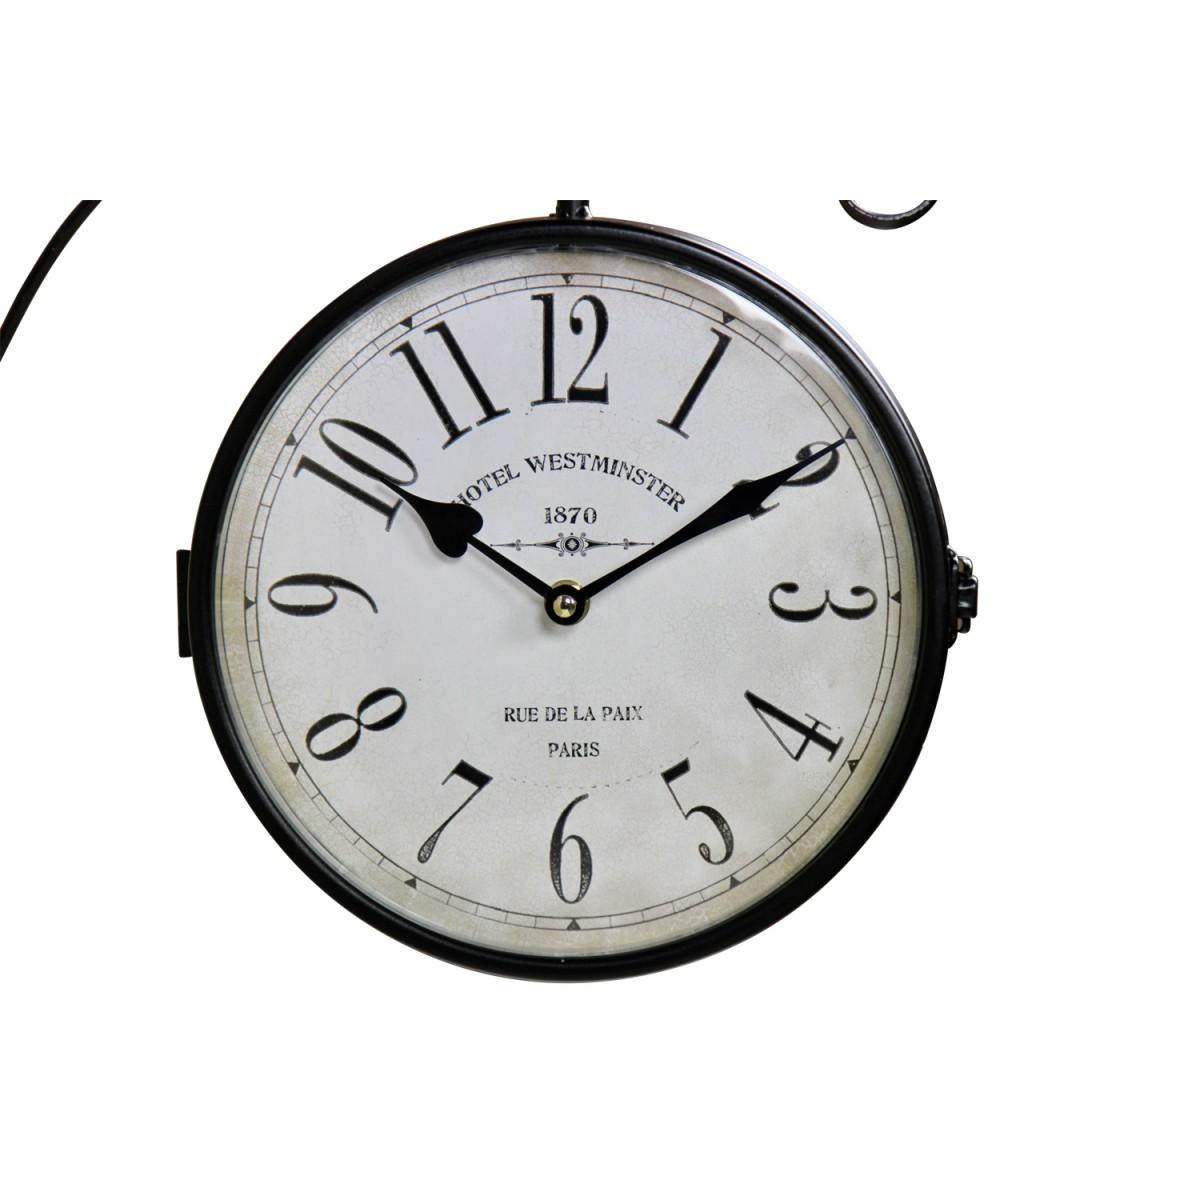 Horloge De Gare Ancienne Double Face Hôtel Westminster Fer Forge Blanc 24cm